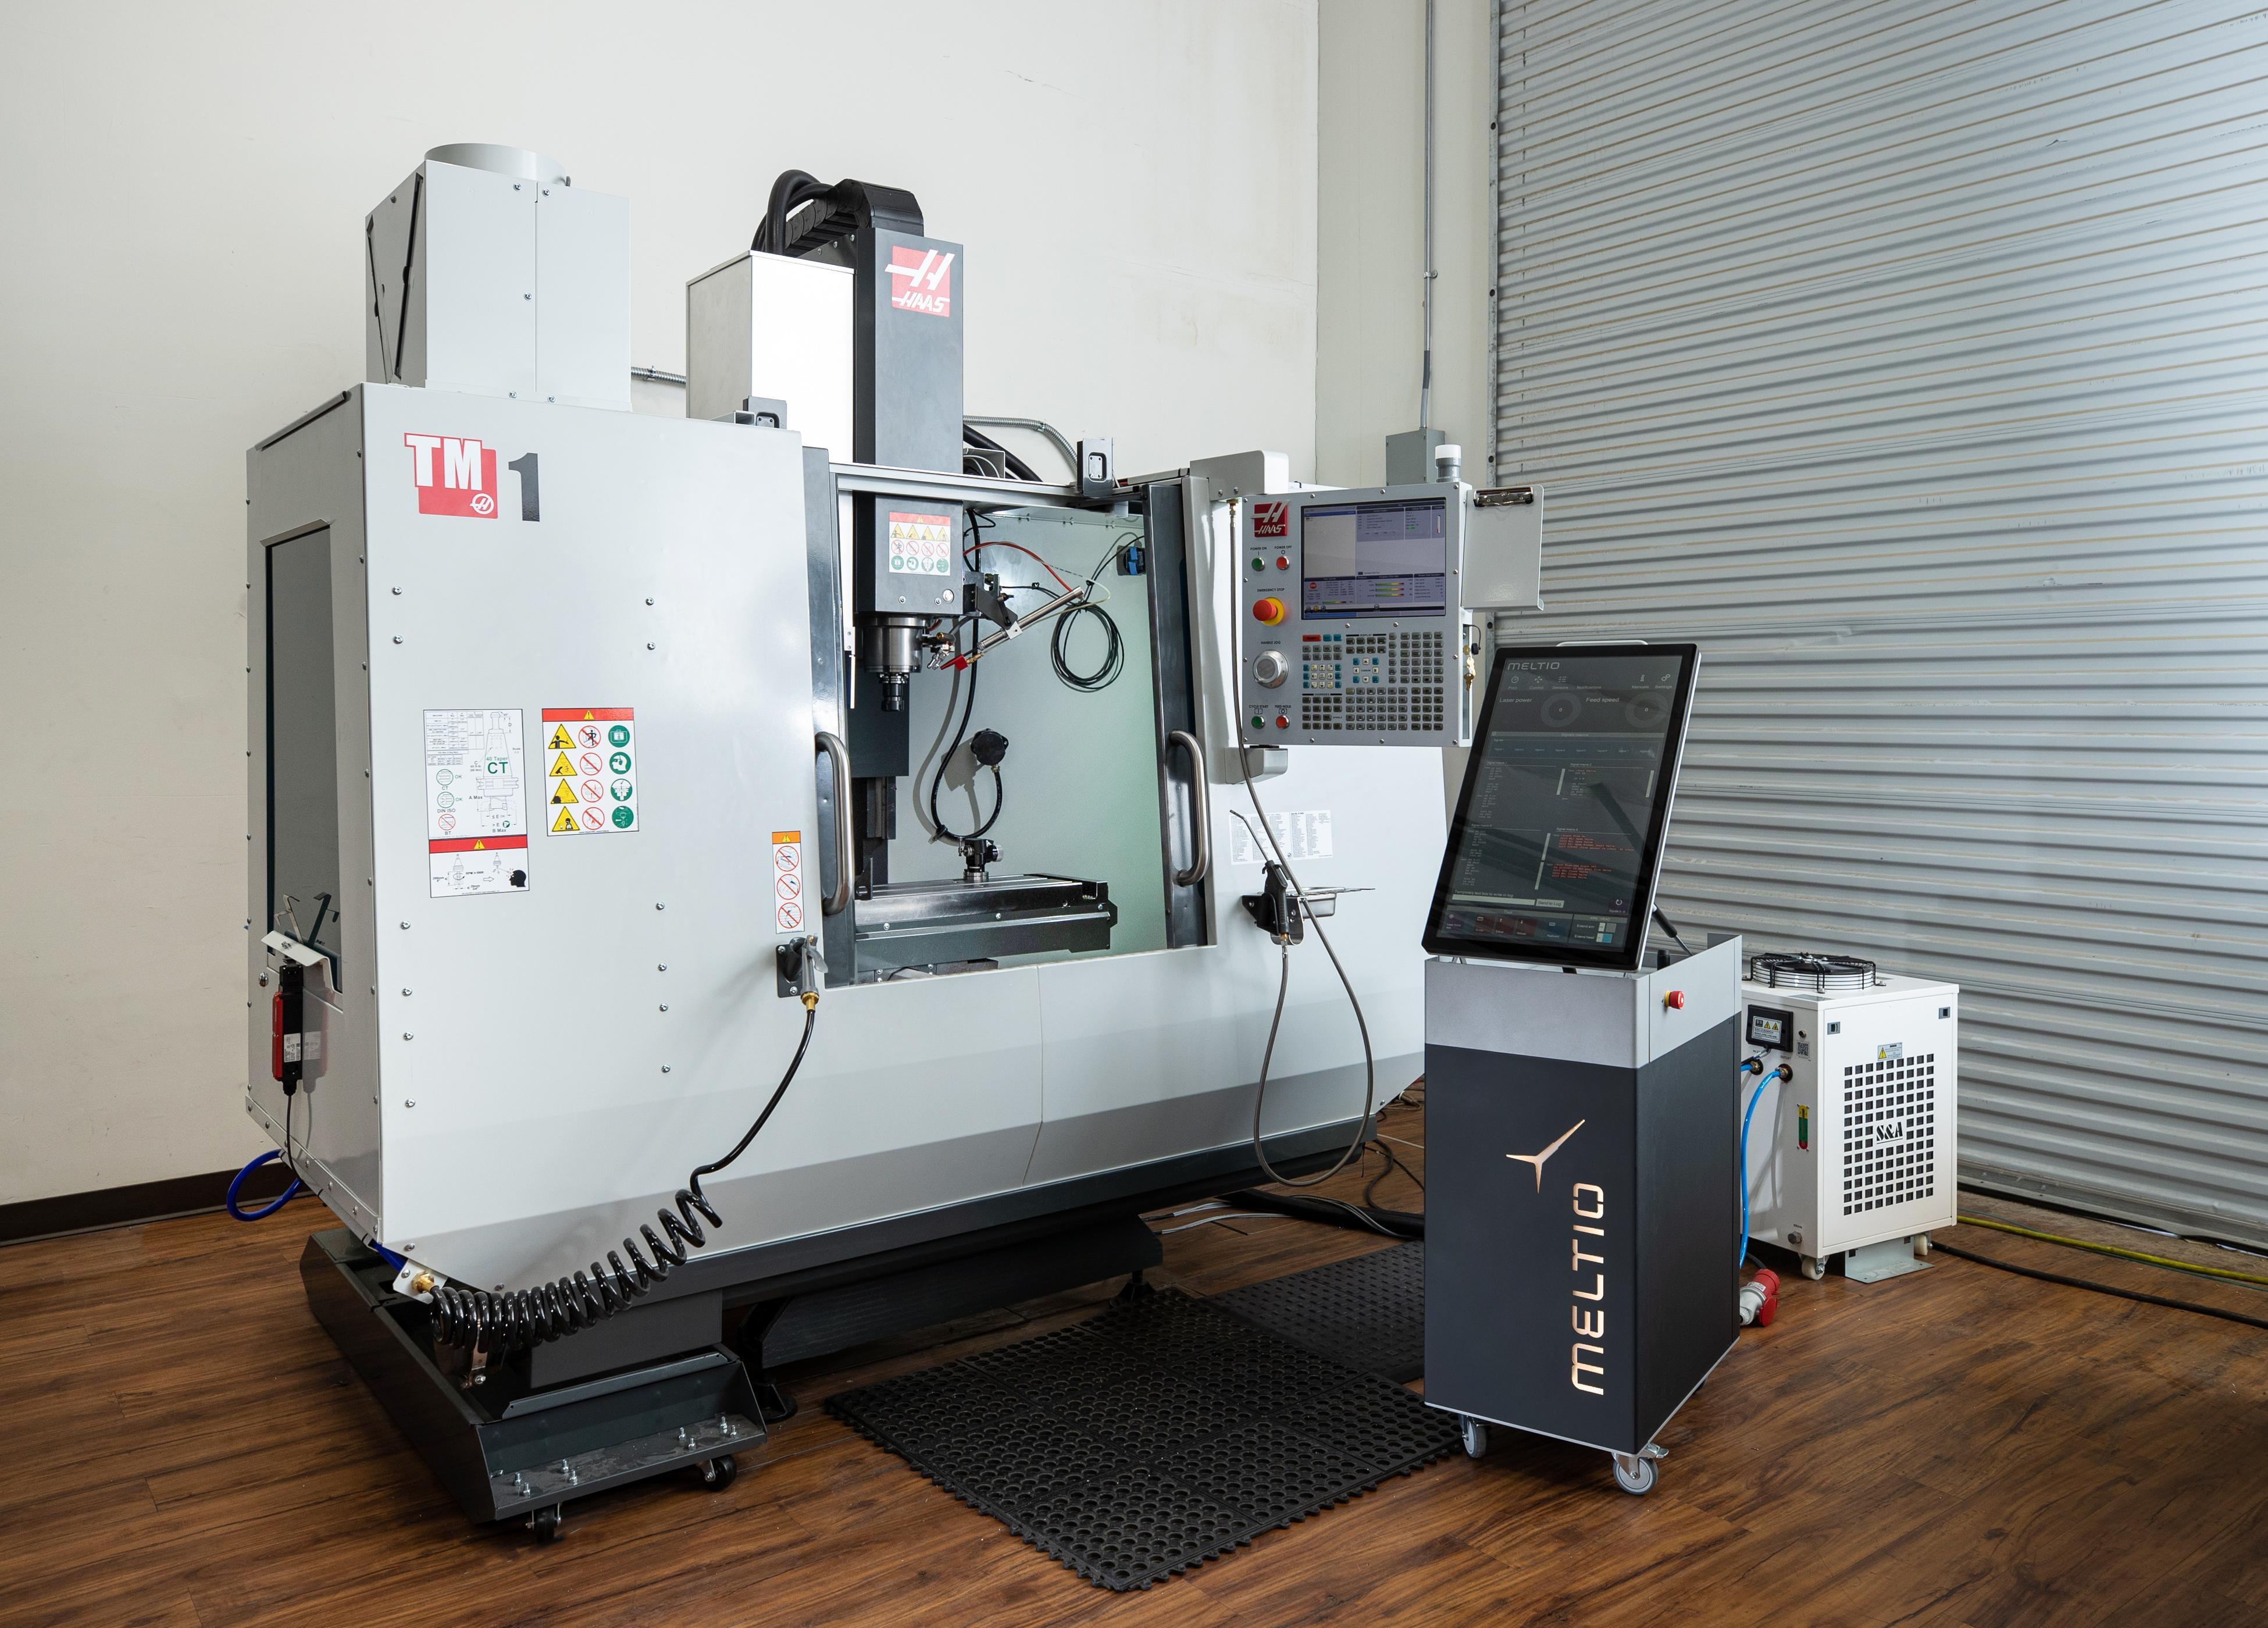 The Meltio Engine integrated with a Haas CNC machine. Photo via Meltio.